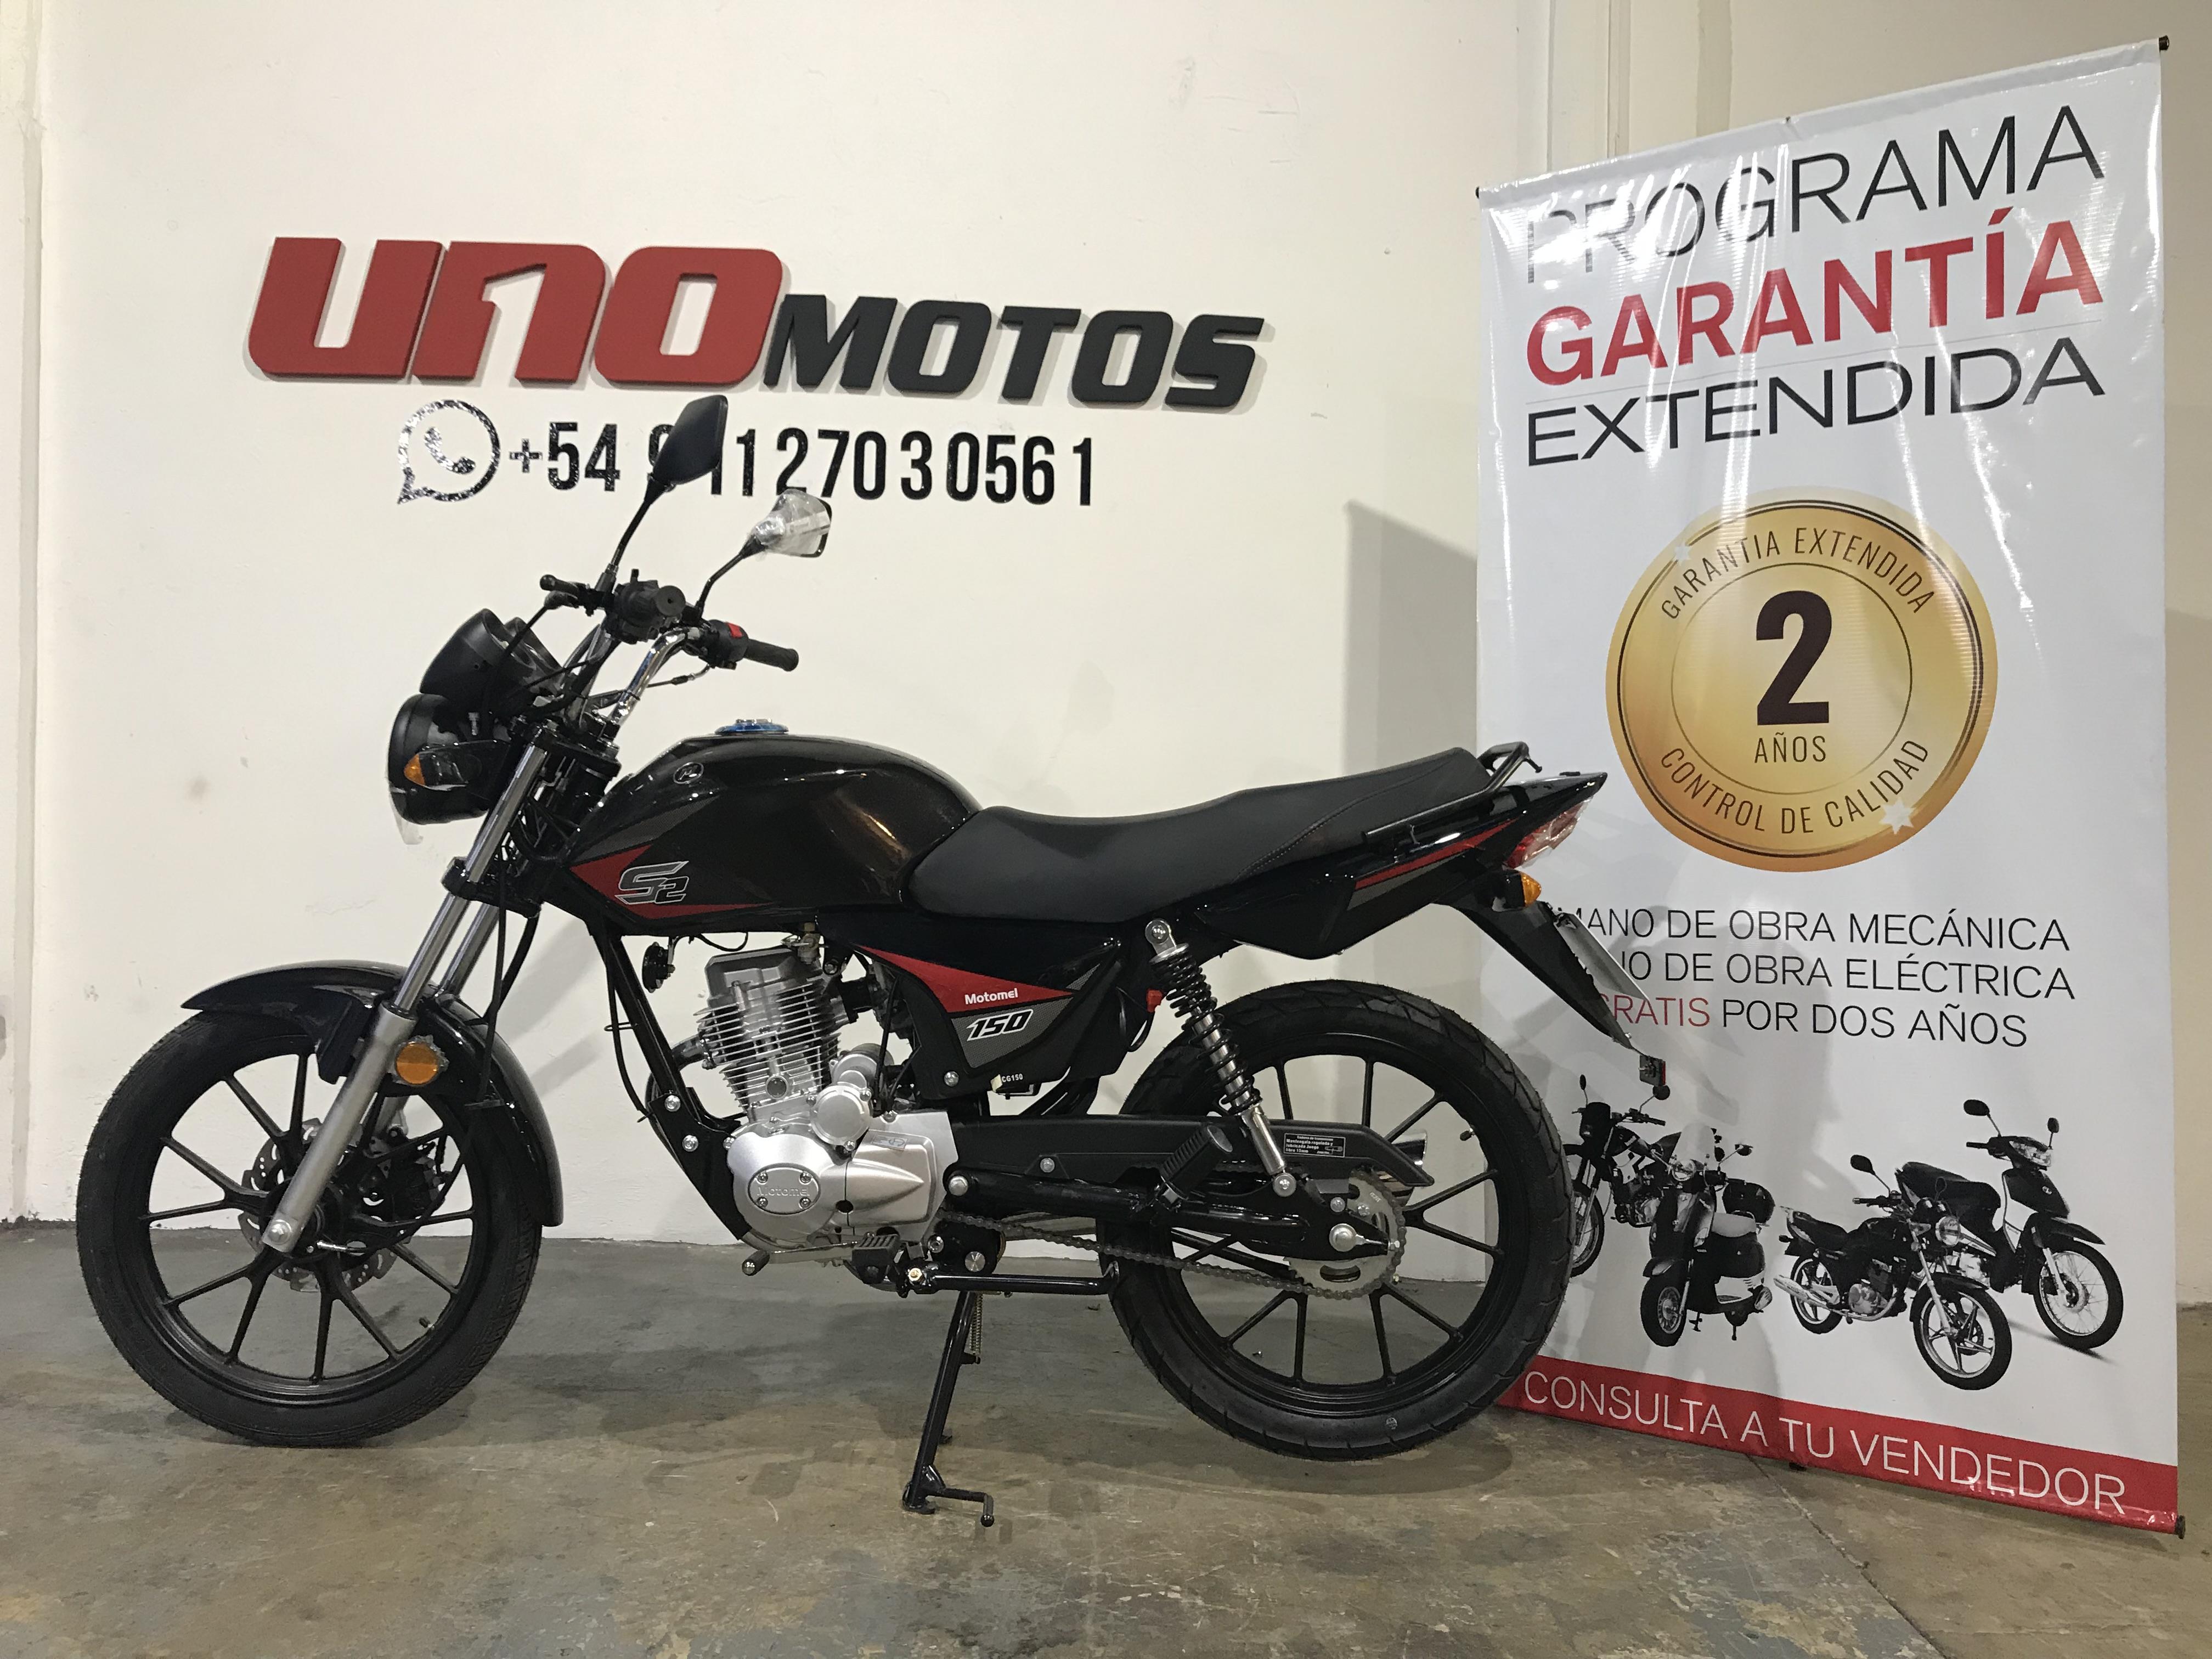 Moto Motomel CG 150 S2 Full linea 2019 OUTLET int: 18340